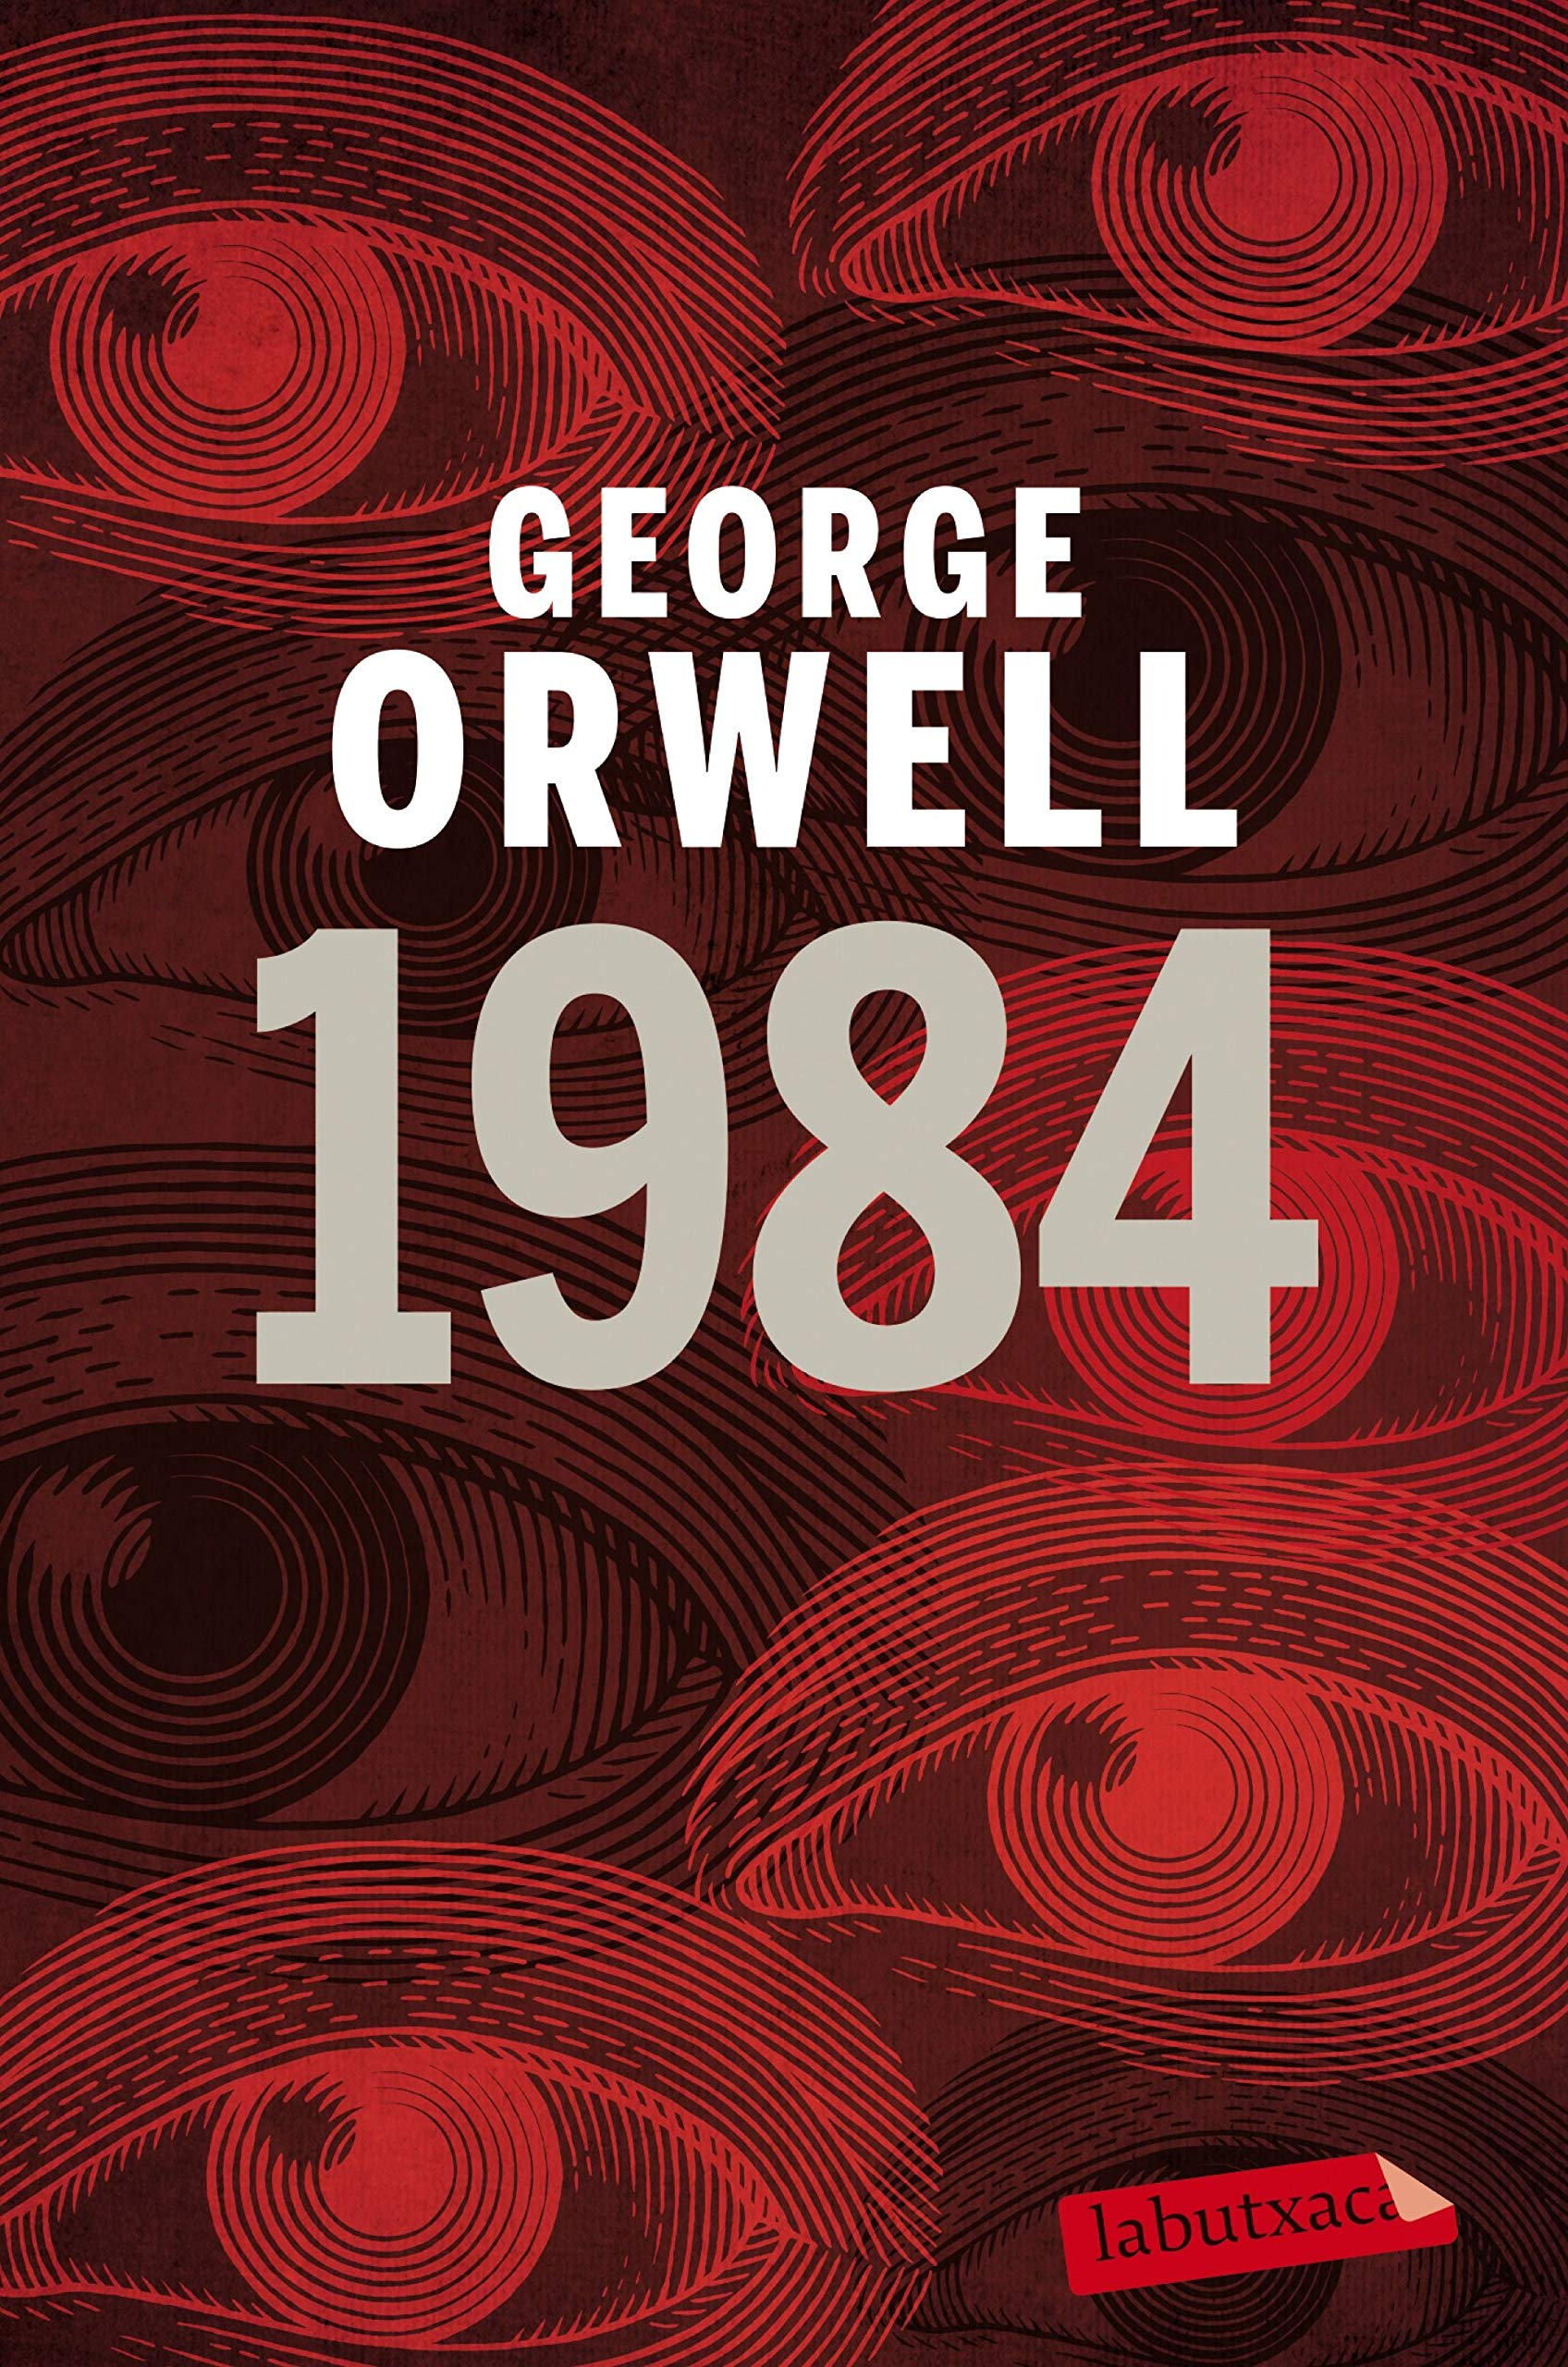 1984 (LABUTXACA): Amazon.es: Orwell, George, Baulenas, Lluís-Anton ...